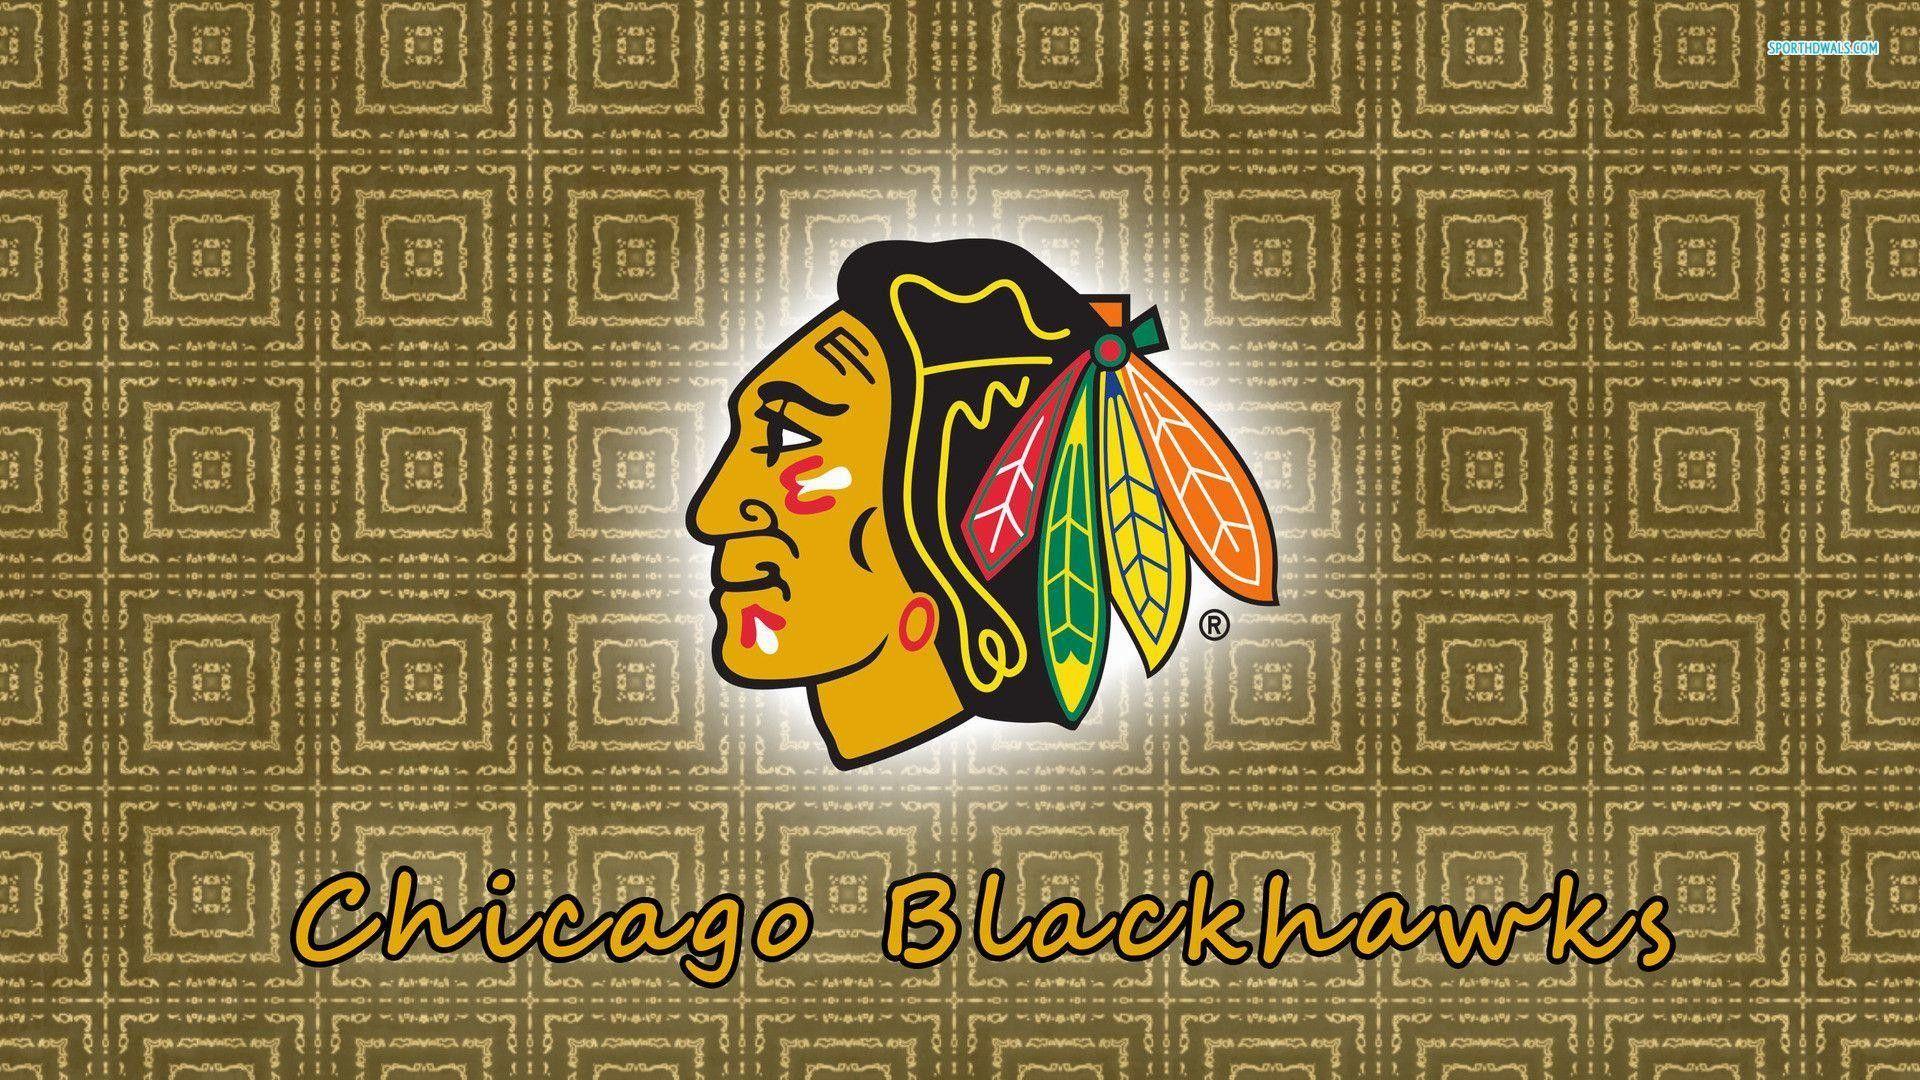 Blackhawks Wallpaper Laptop 2021 Live Wallpaper Hd Blackhawks Wallpaper Chicago Blackhawks Wallpapers Chicago Blackhawks